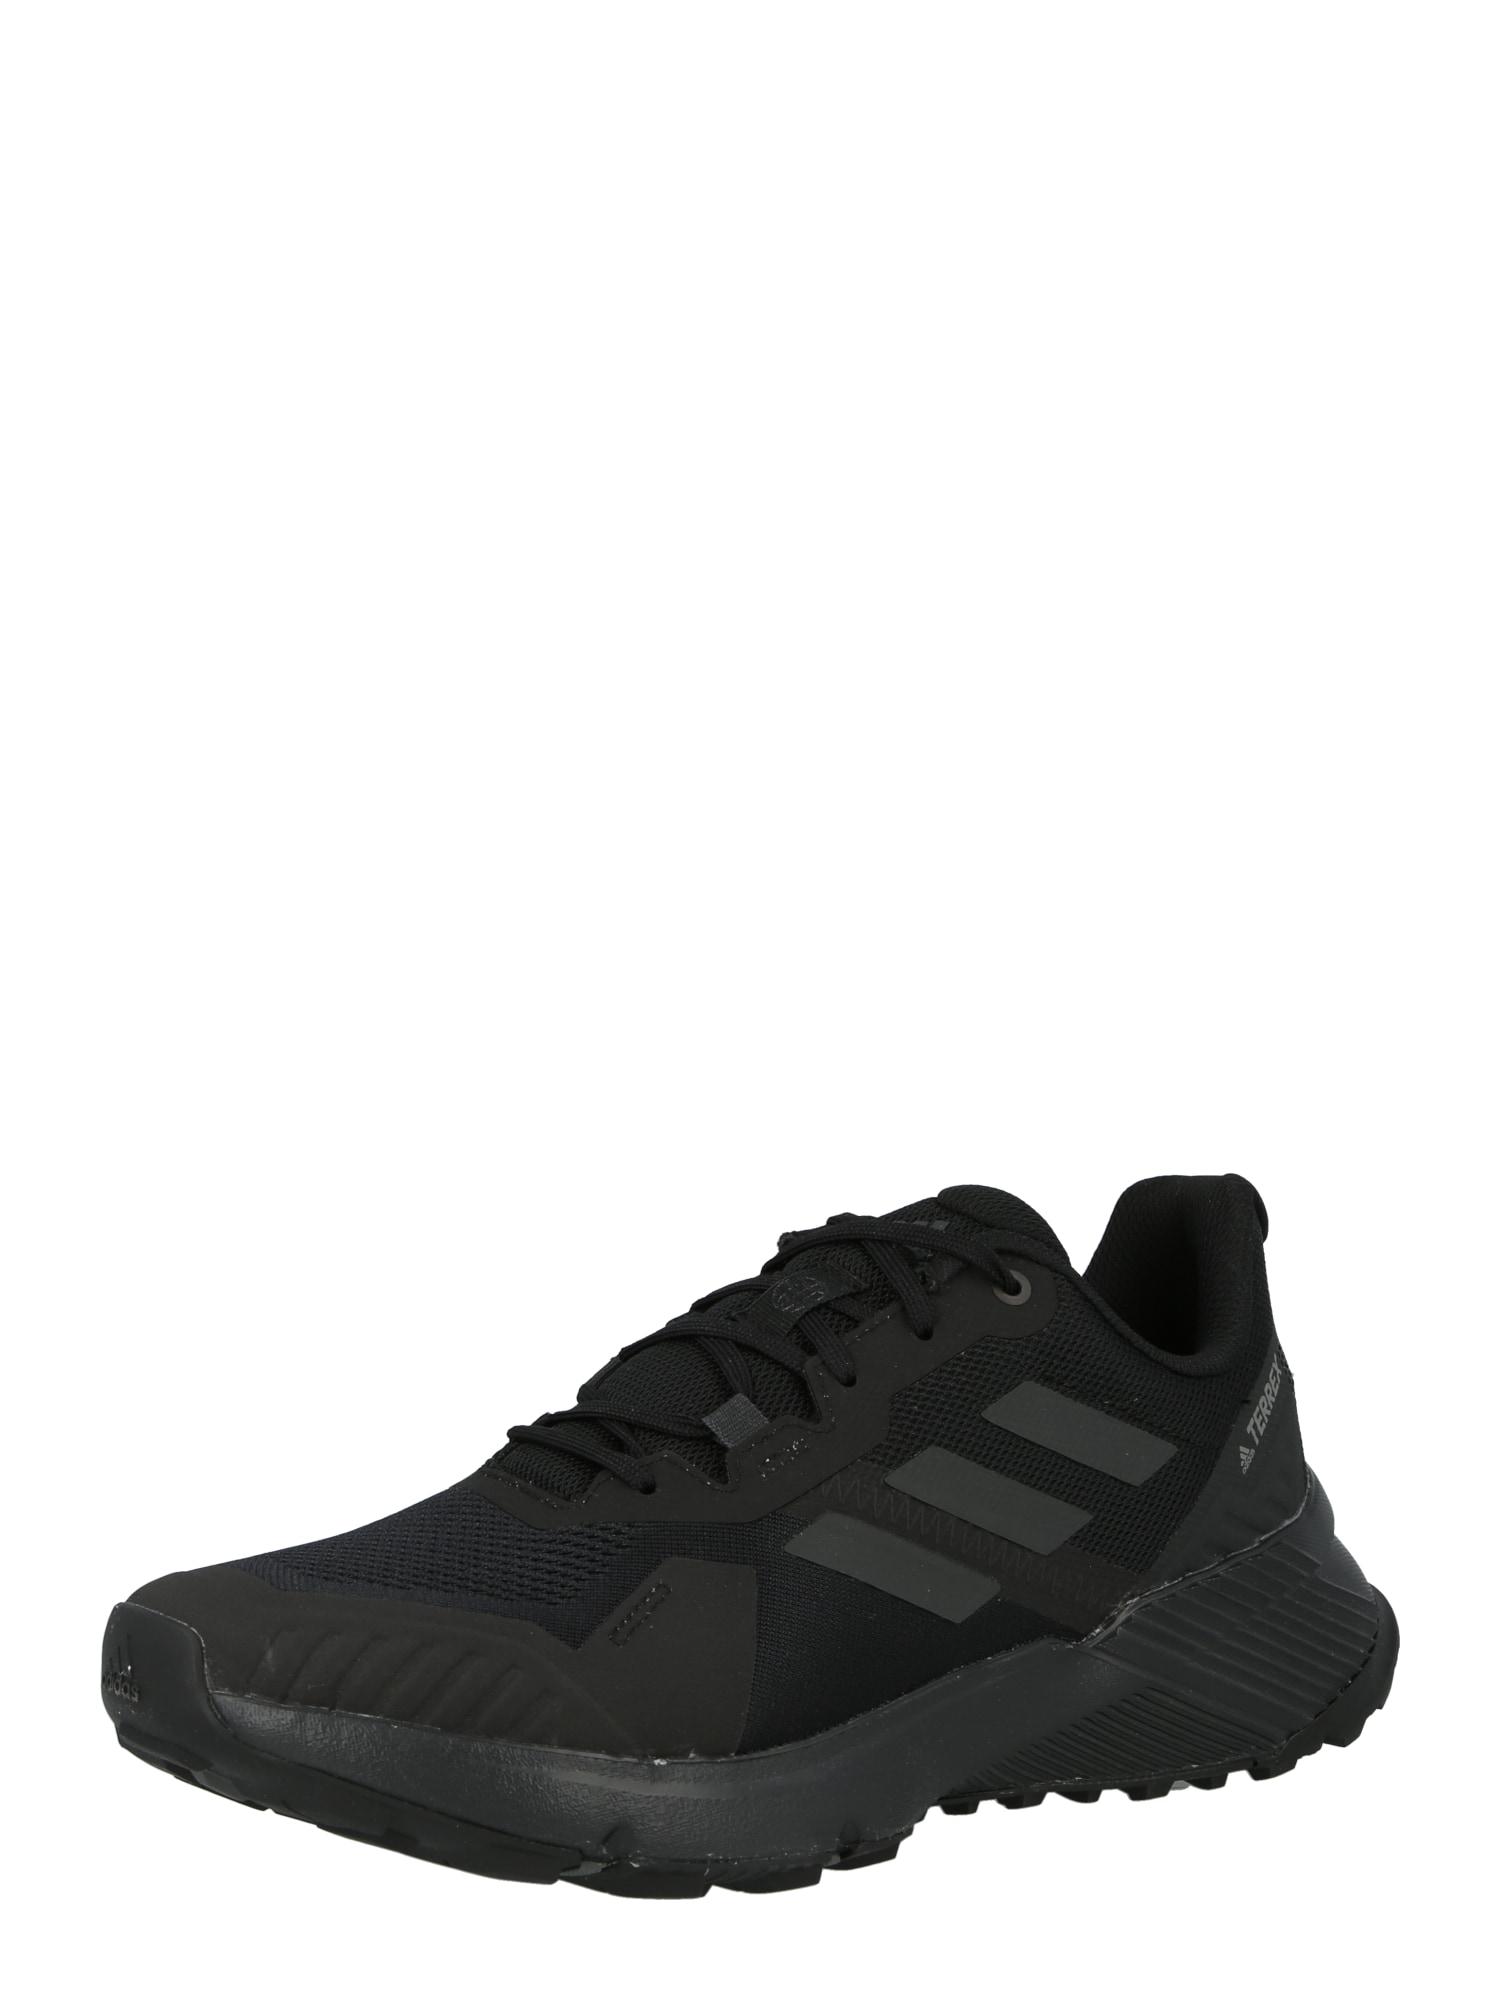 ADIDAS PERFORMANCE Běžecká obuv 'TERREX SOULSTRIDE'  černá